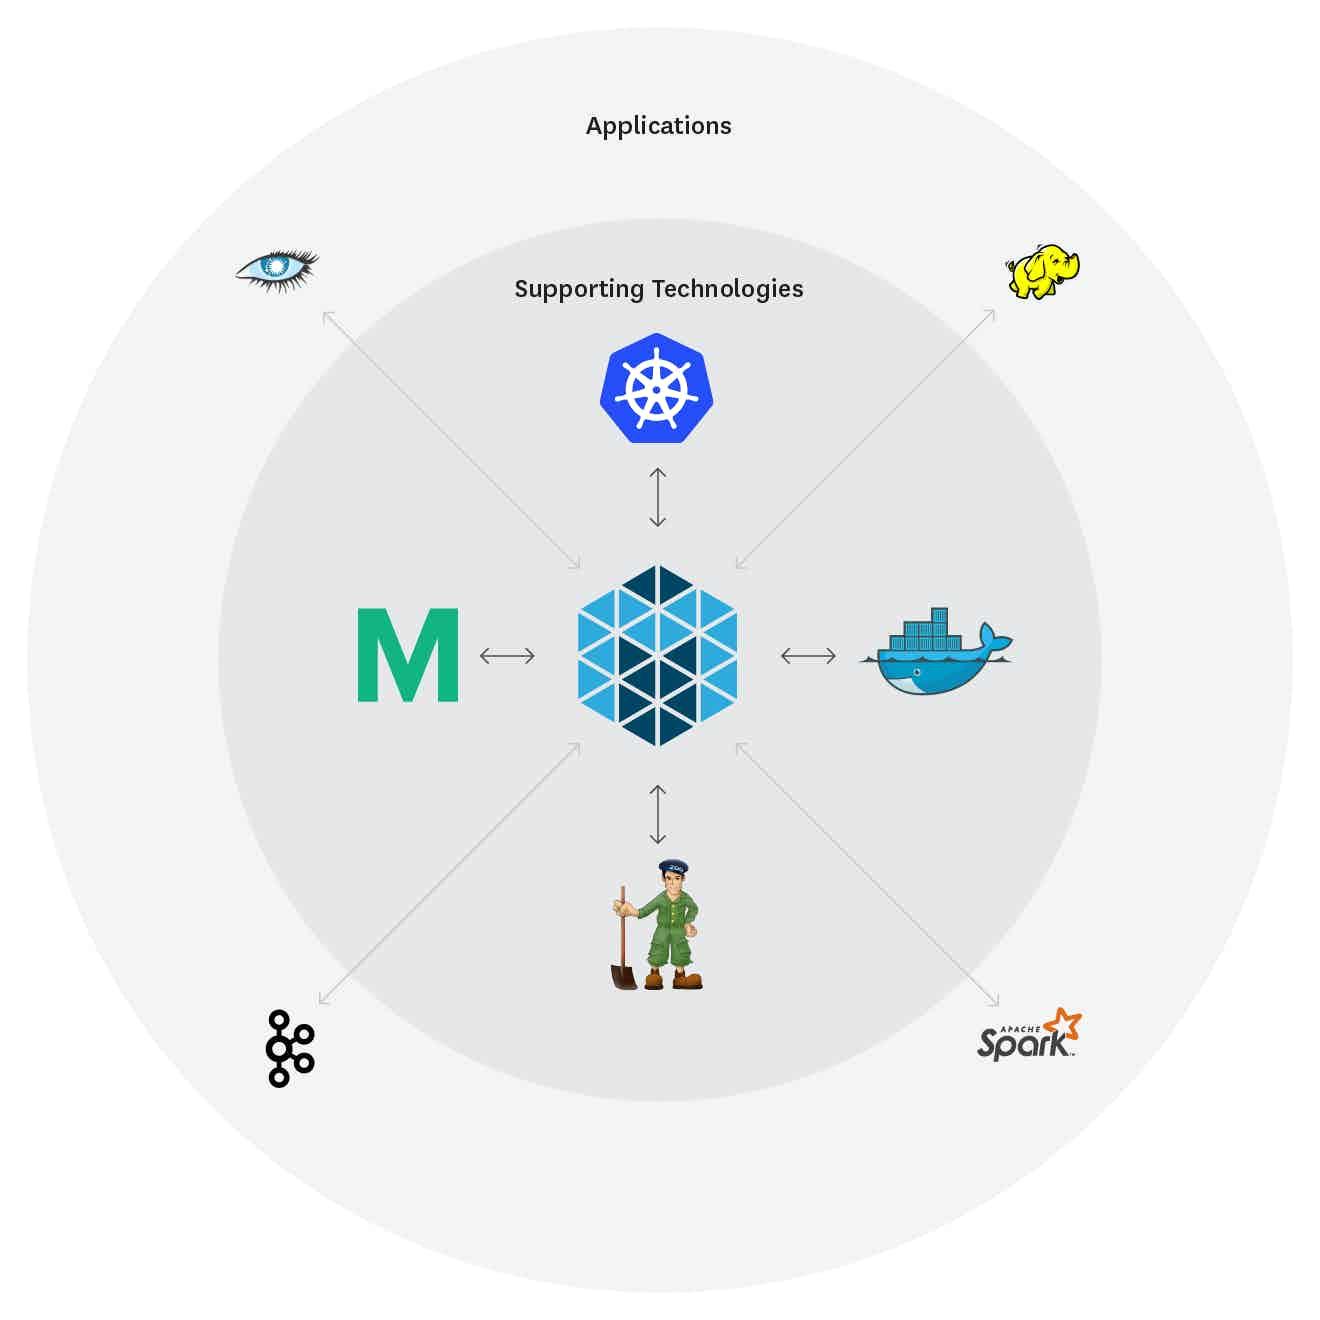 Mesos ecosystem logos